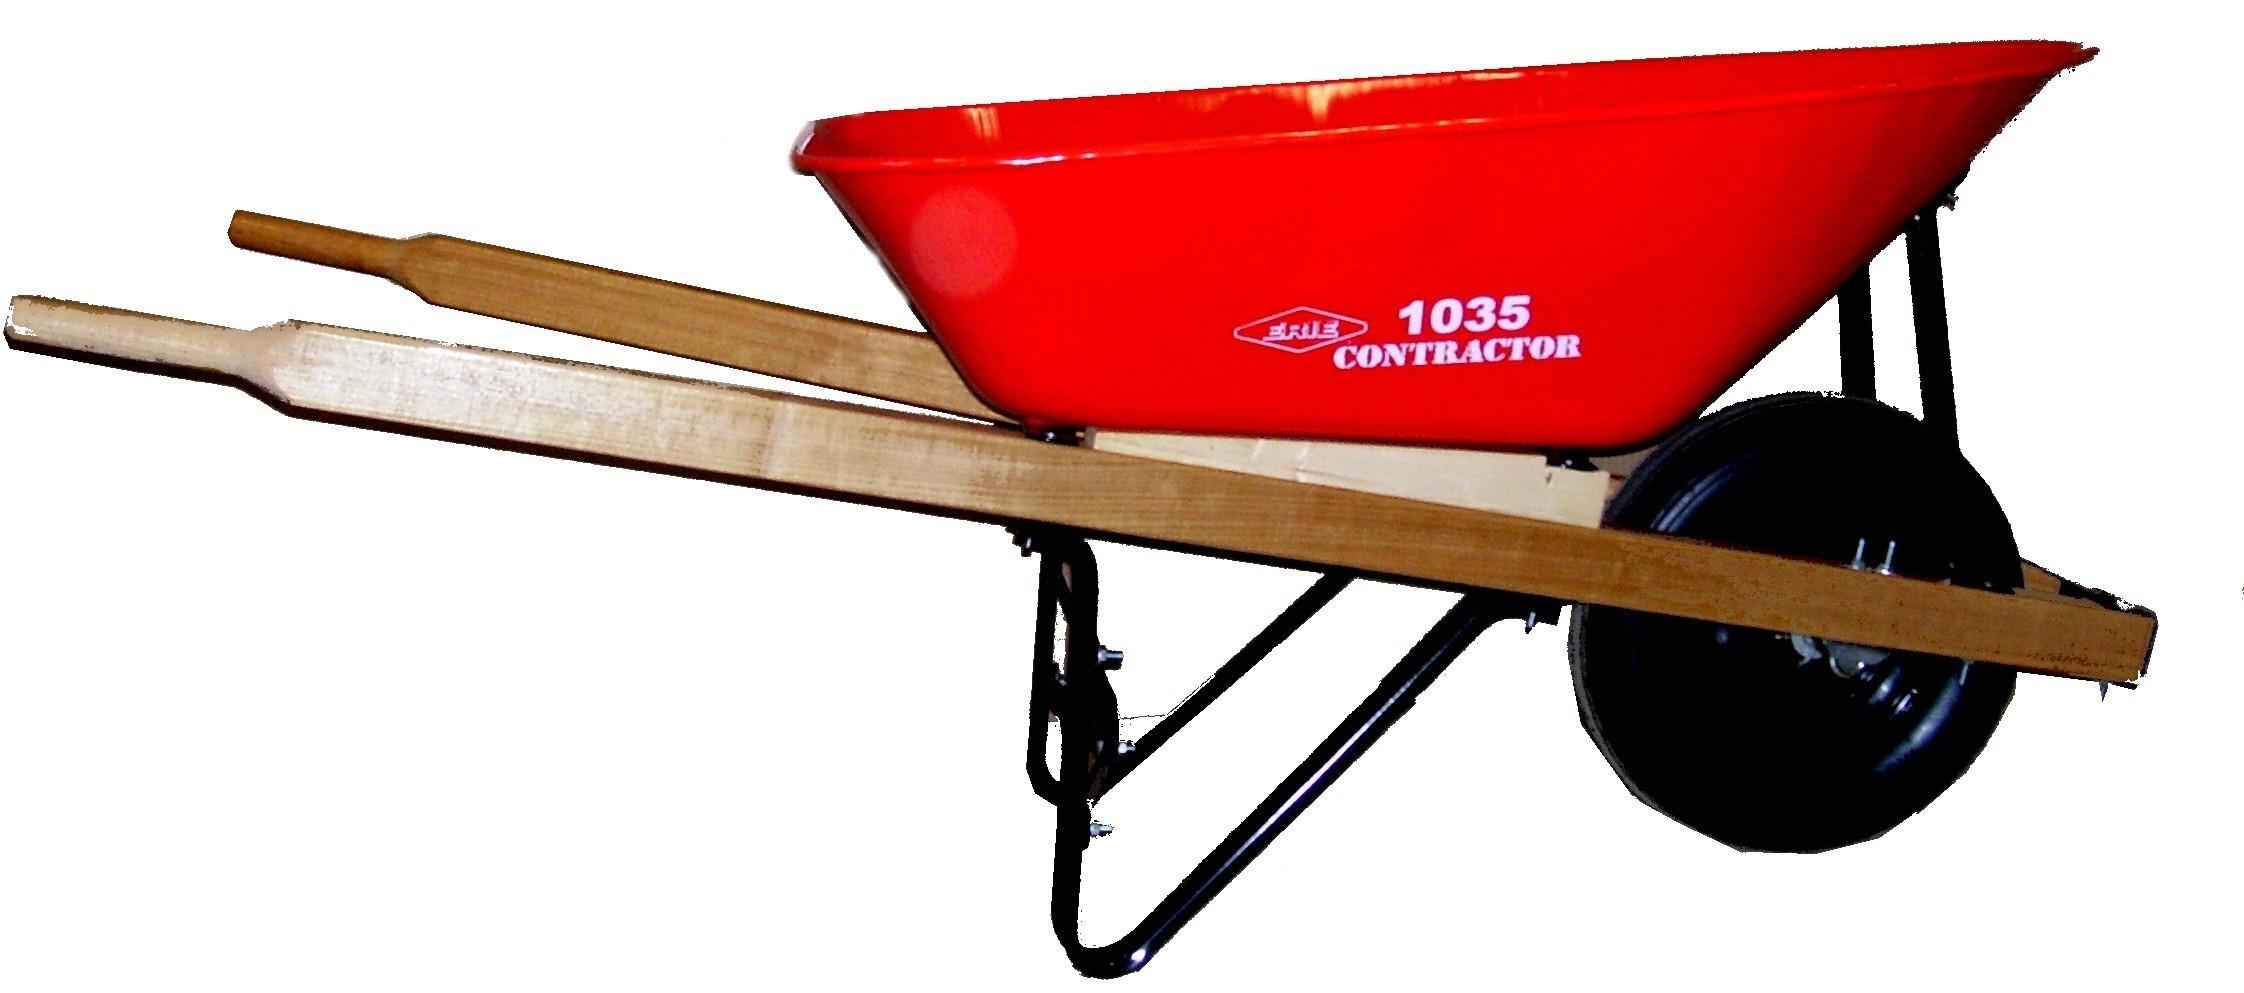 Sinclair Erie Contractor Wheelbarrow Rentquip Canada